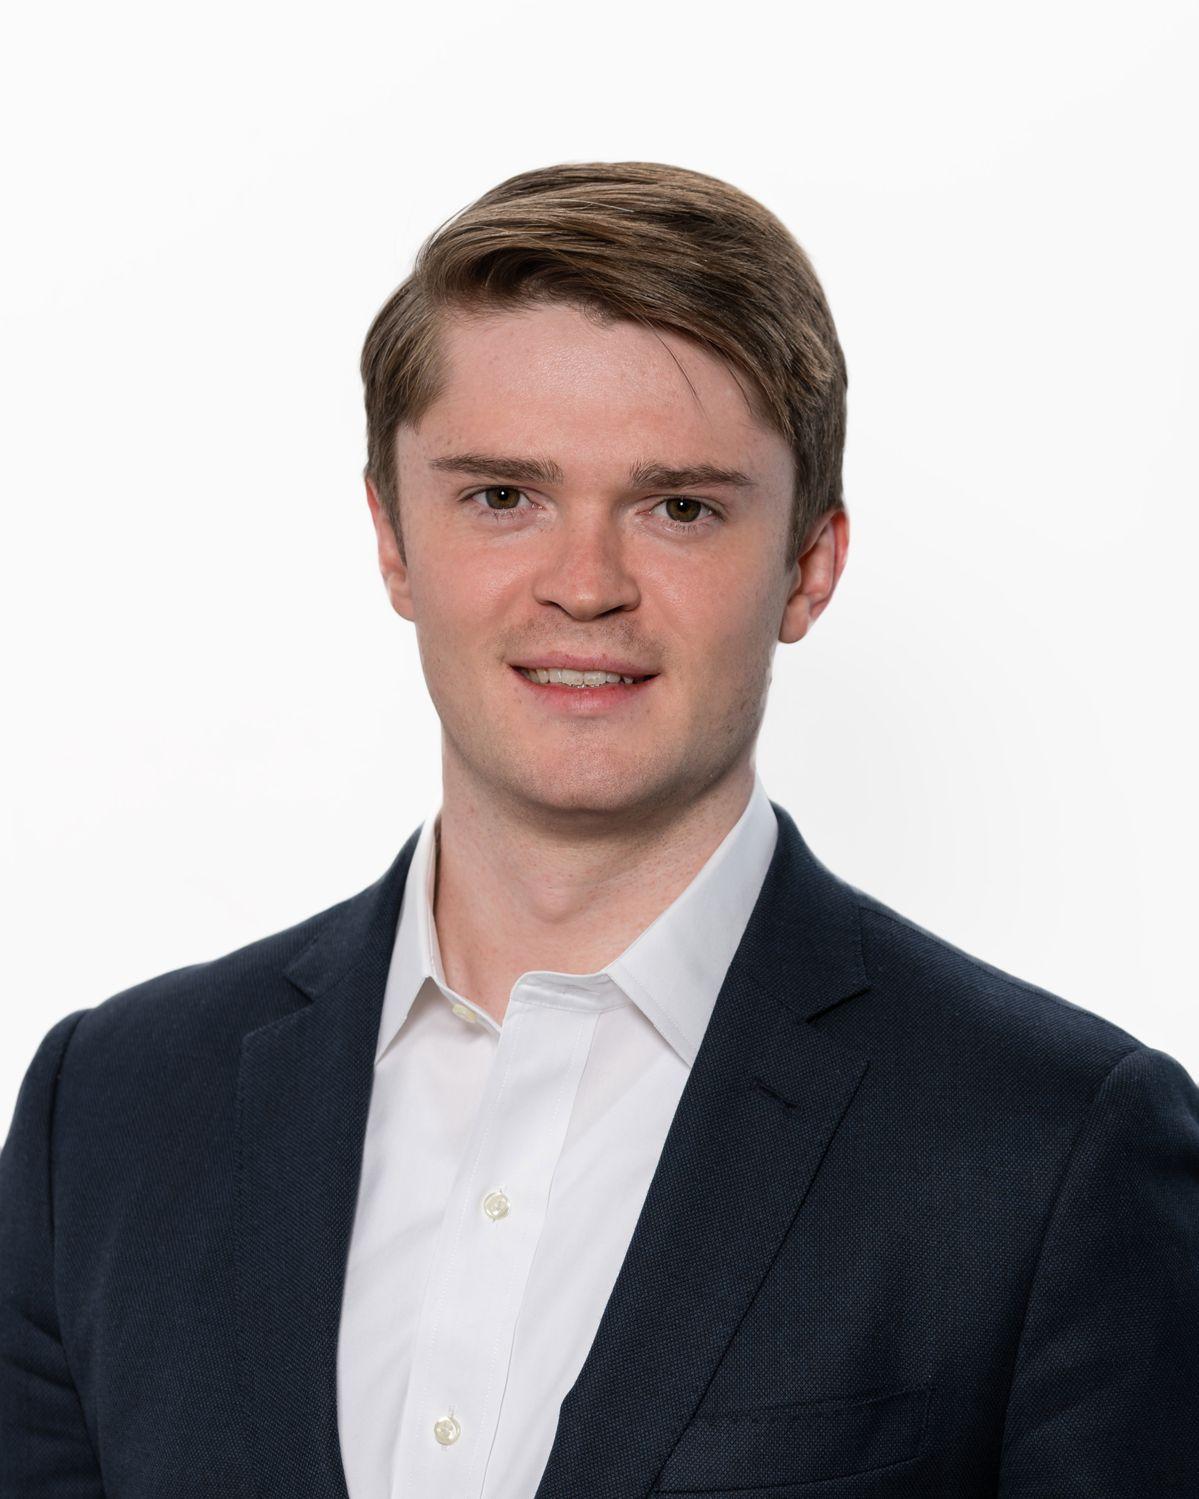 Martis Capital Promotes Chris Beall to Principal, Martis Capital